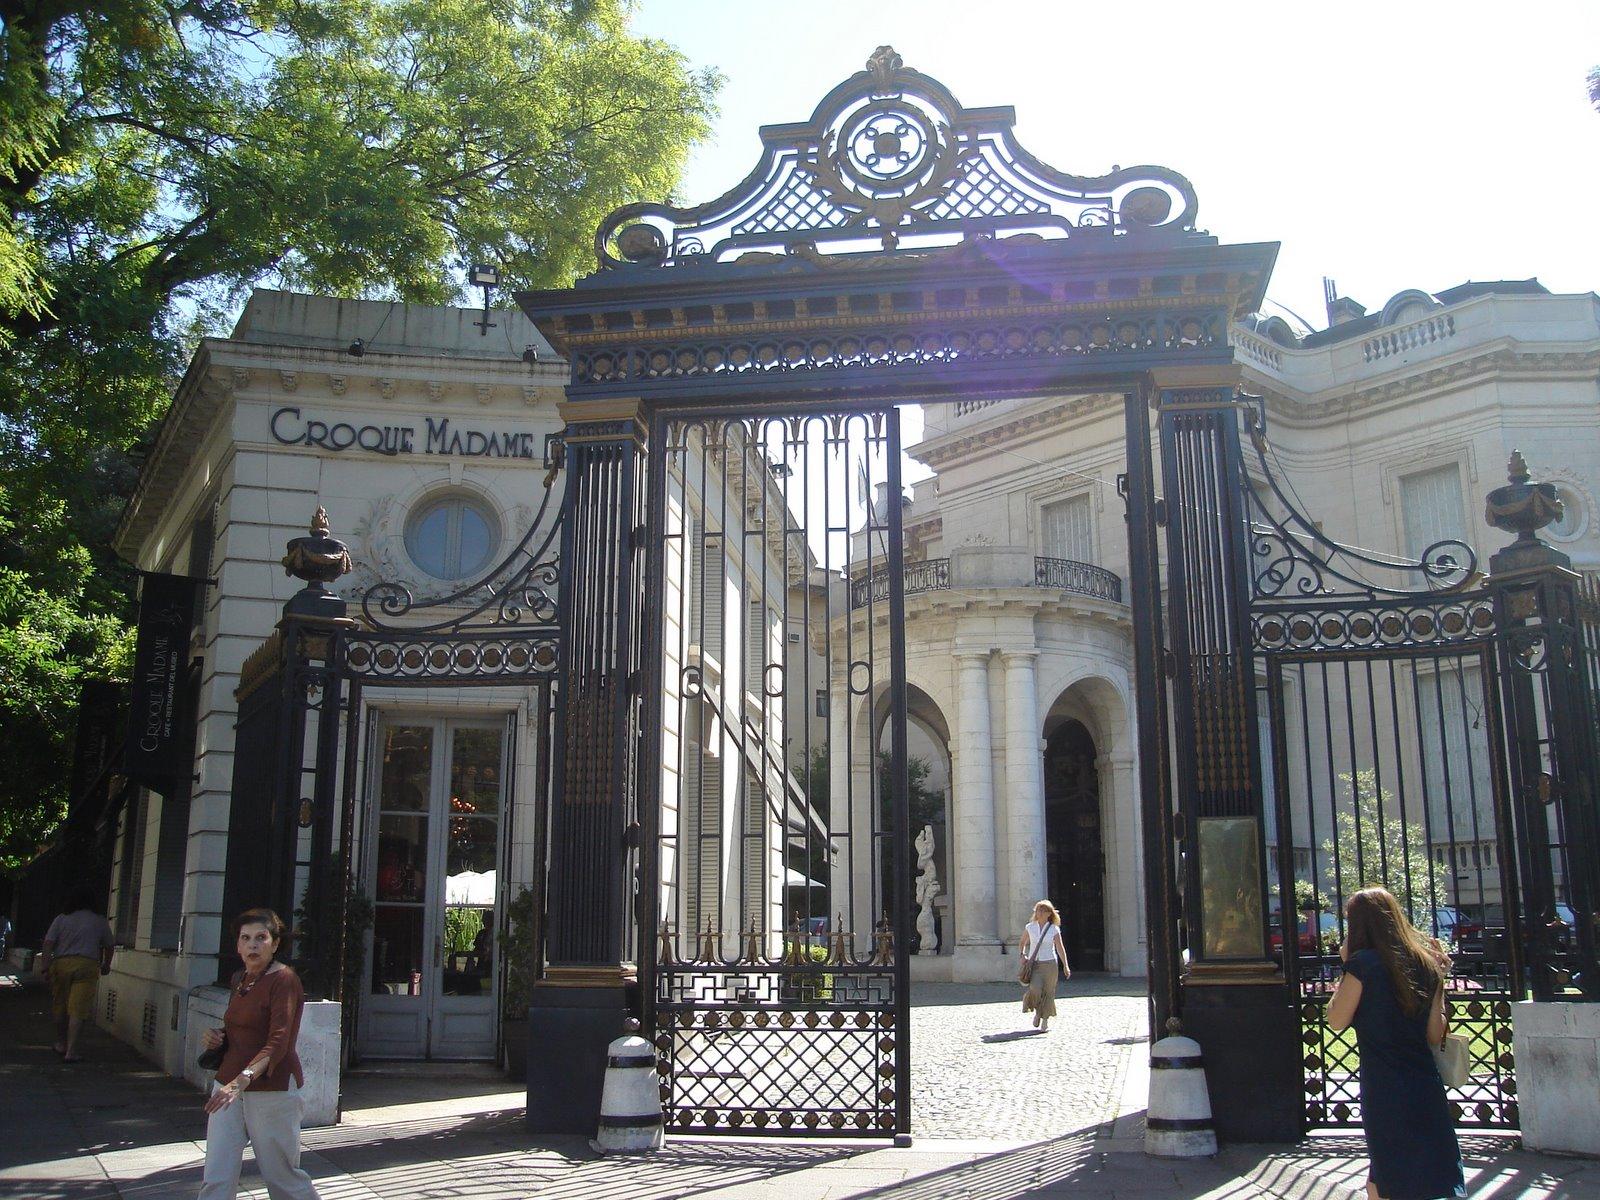 National museum of decorative arts buenos aires my buenos aires travel guide - Museum decorative arts paris ...